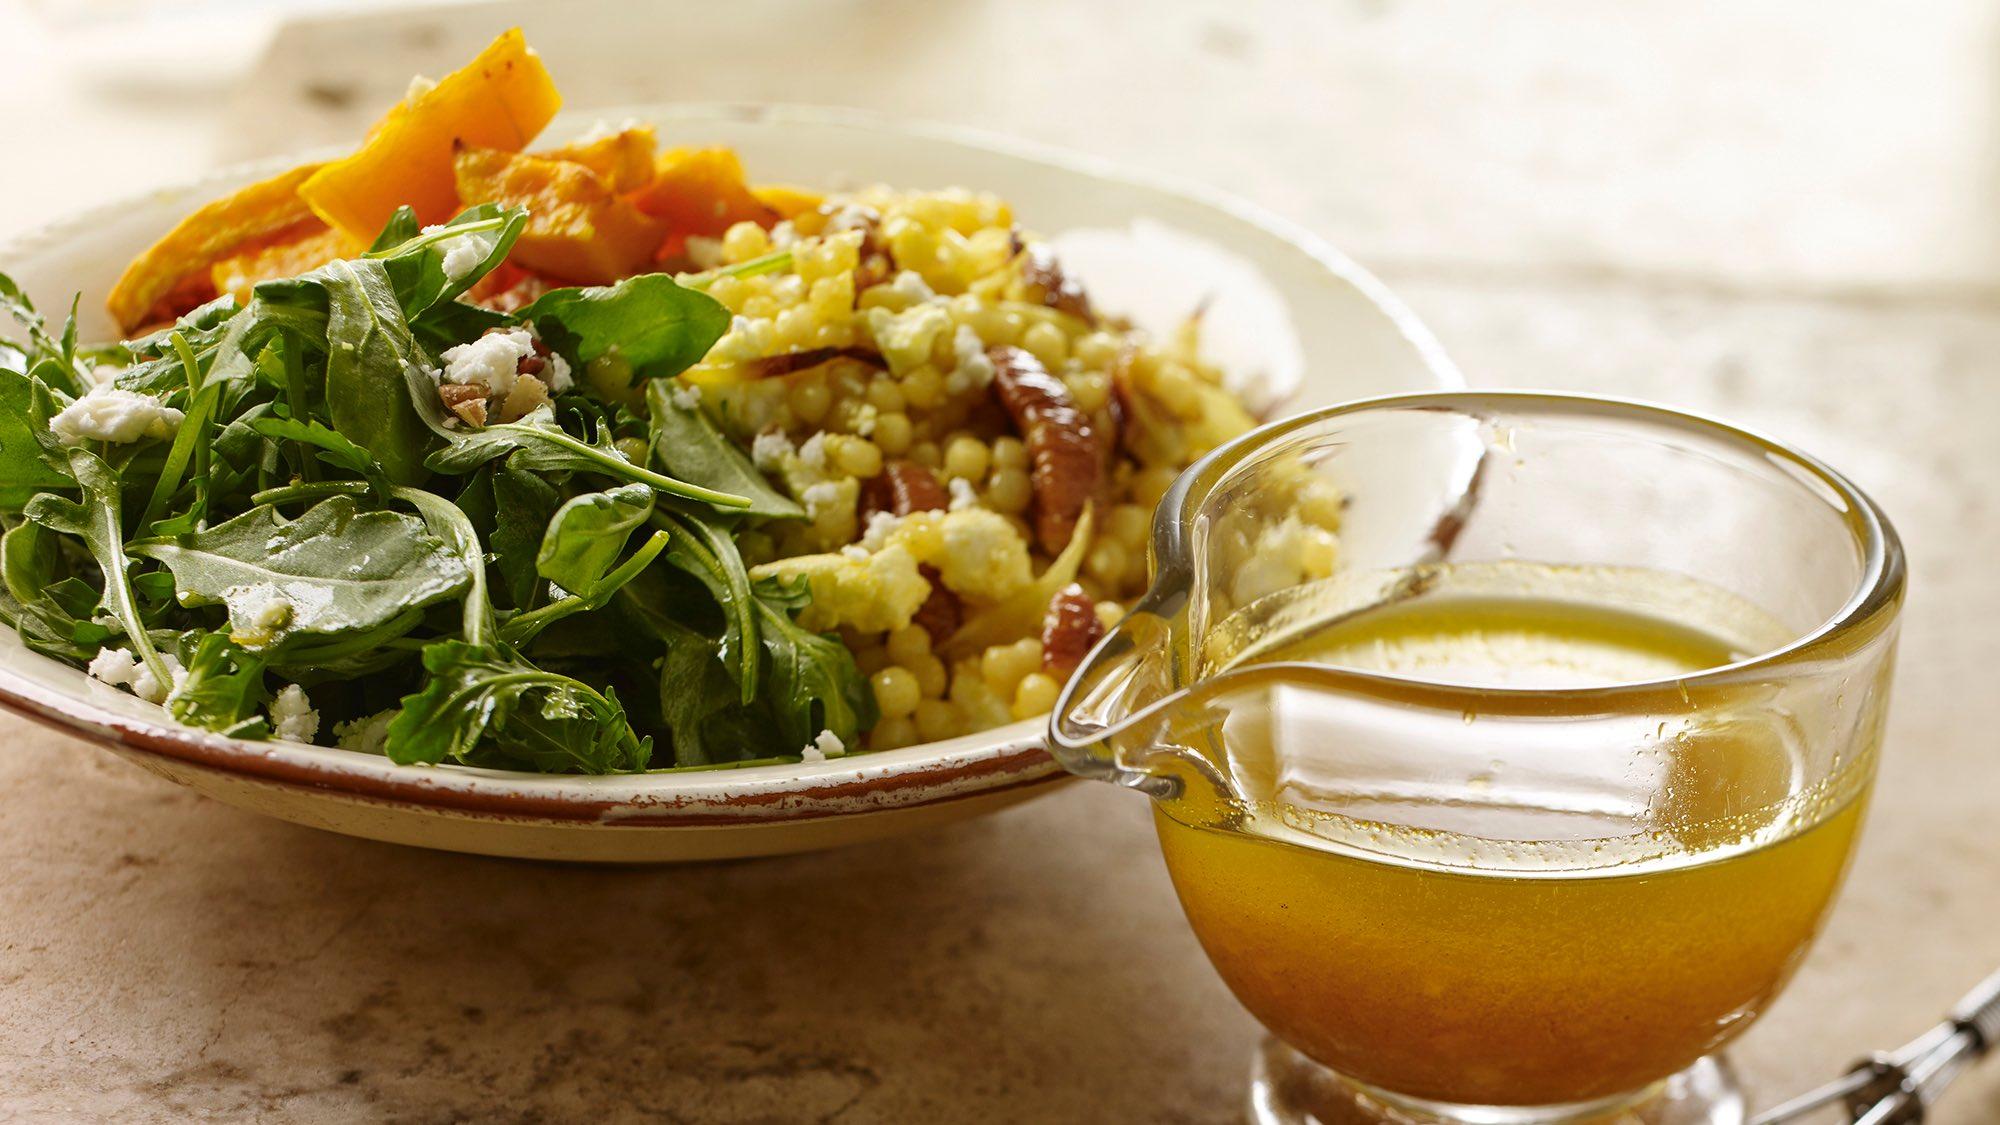 McCormick Turmeric Salad Dressing